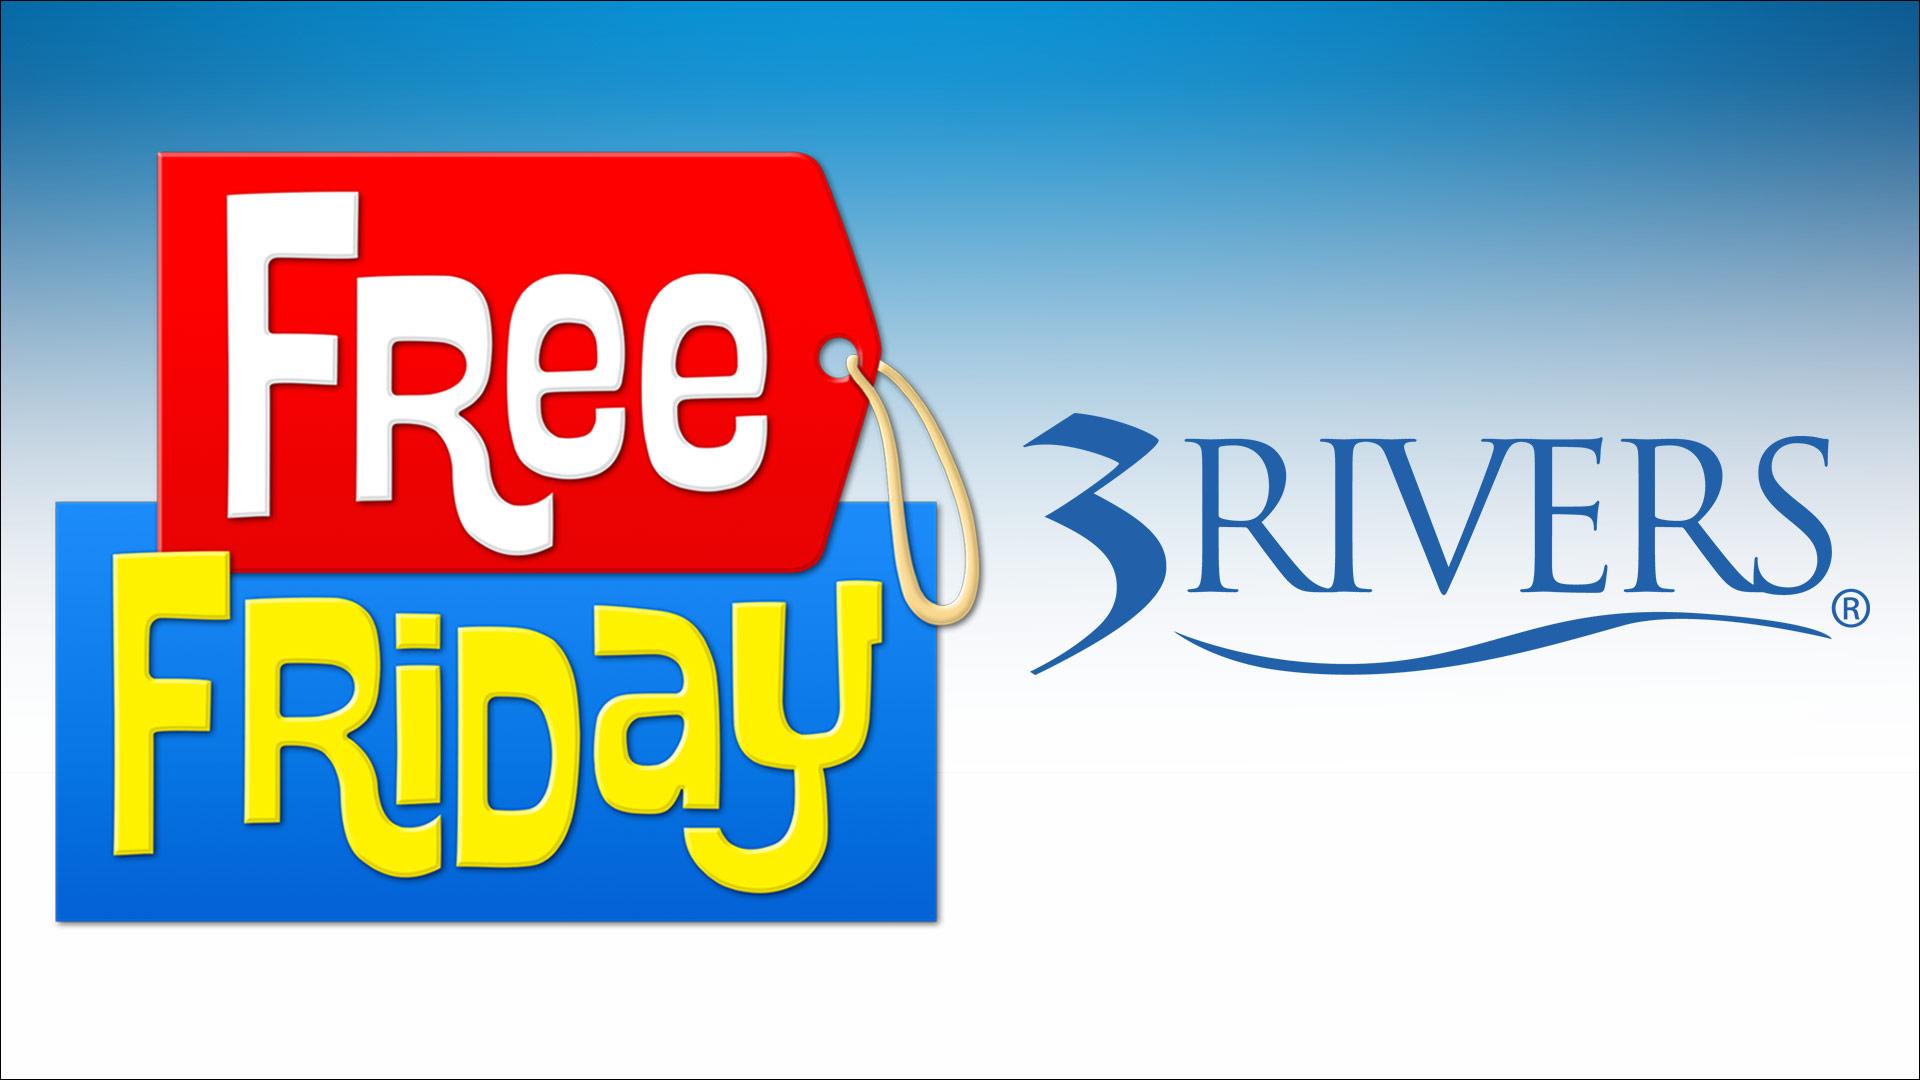 Free Friday 3 Rivers FCU_1528835177069.jpg.jpg